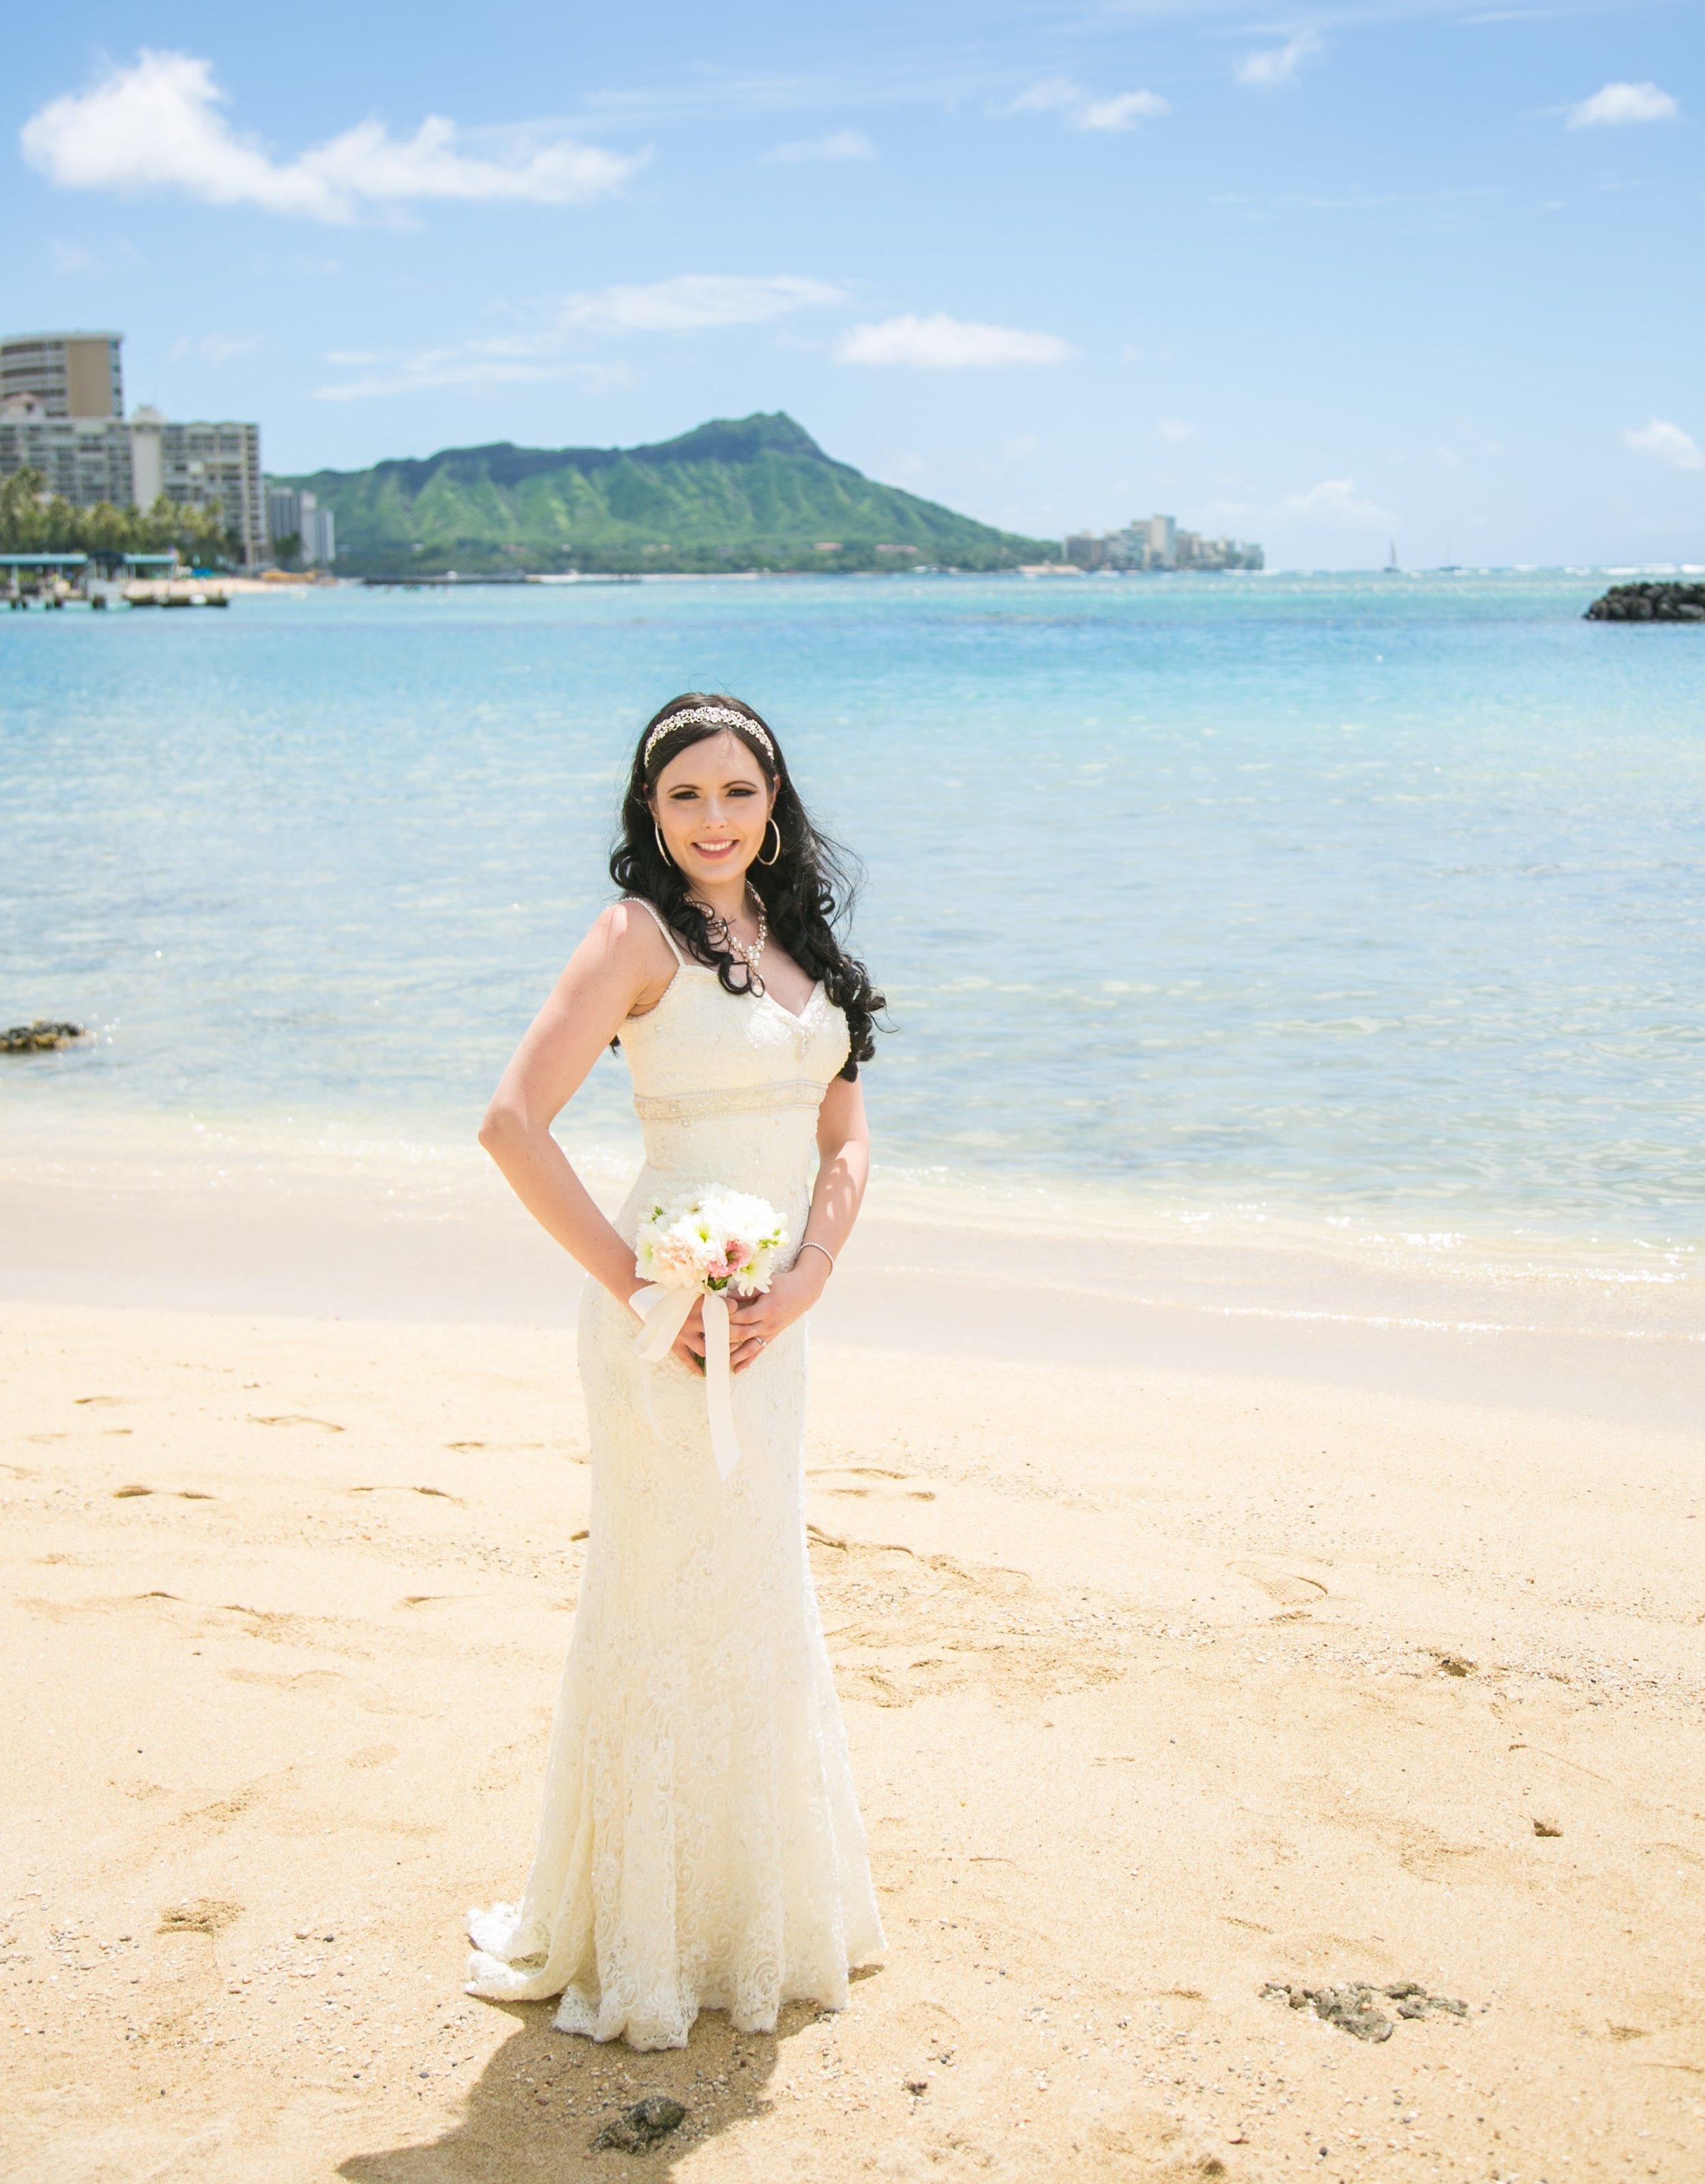 Bride Mermanda - Waikiki Beach Wedding (Diamond Head in the background)